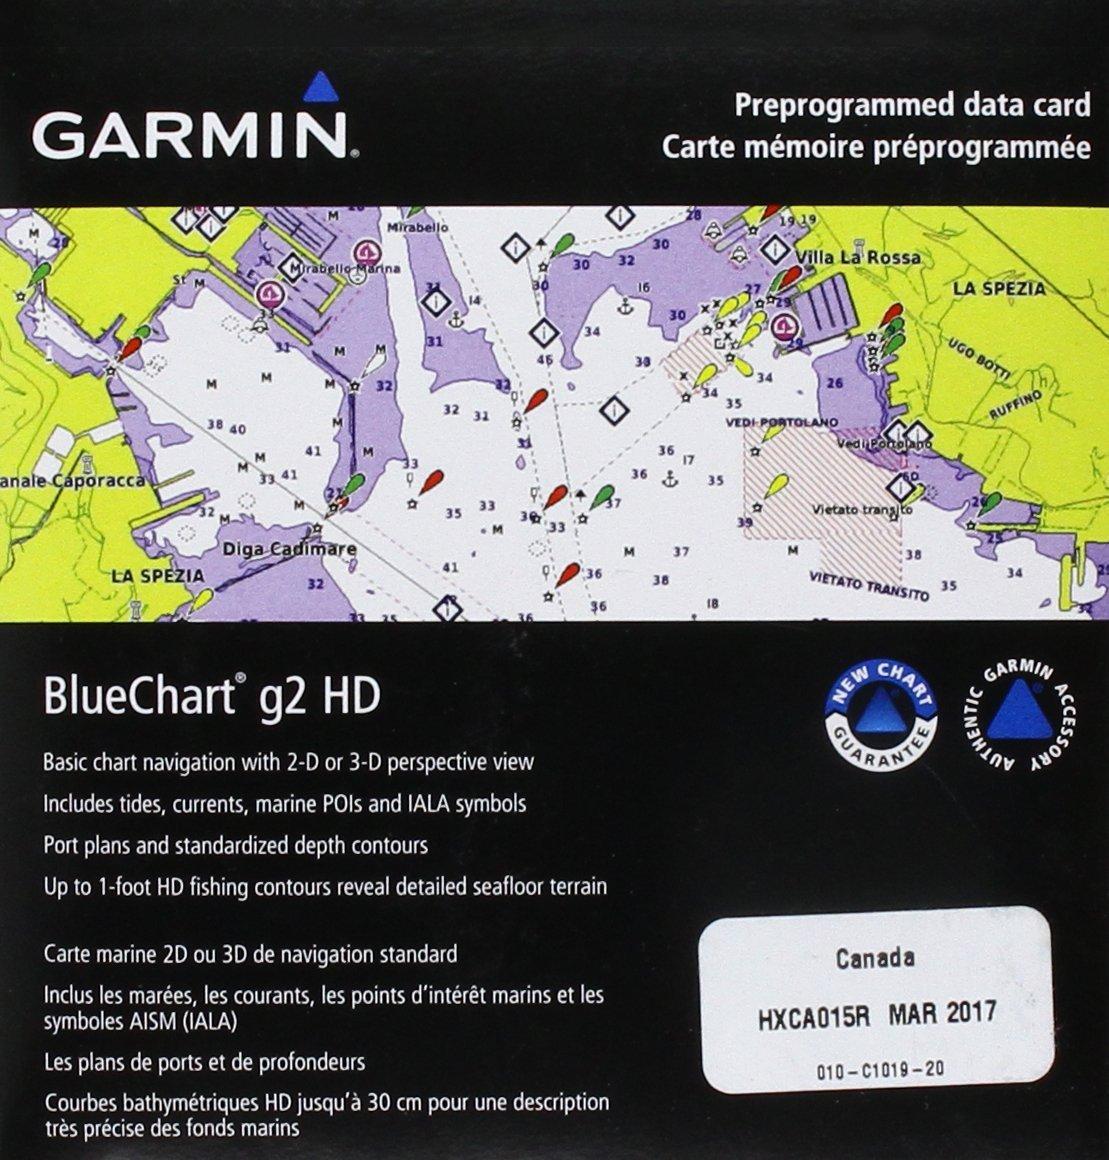 Garmin bluechart g2 canada saltfreshwater map microsd card garmin bluechart g2 canada saltfreshwater map microsd card amazon cell phones accessories biocorpaavc